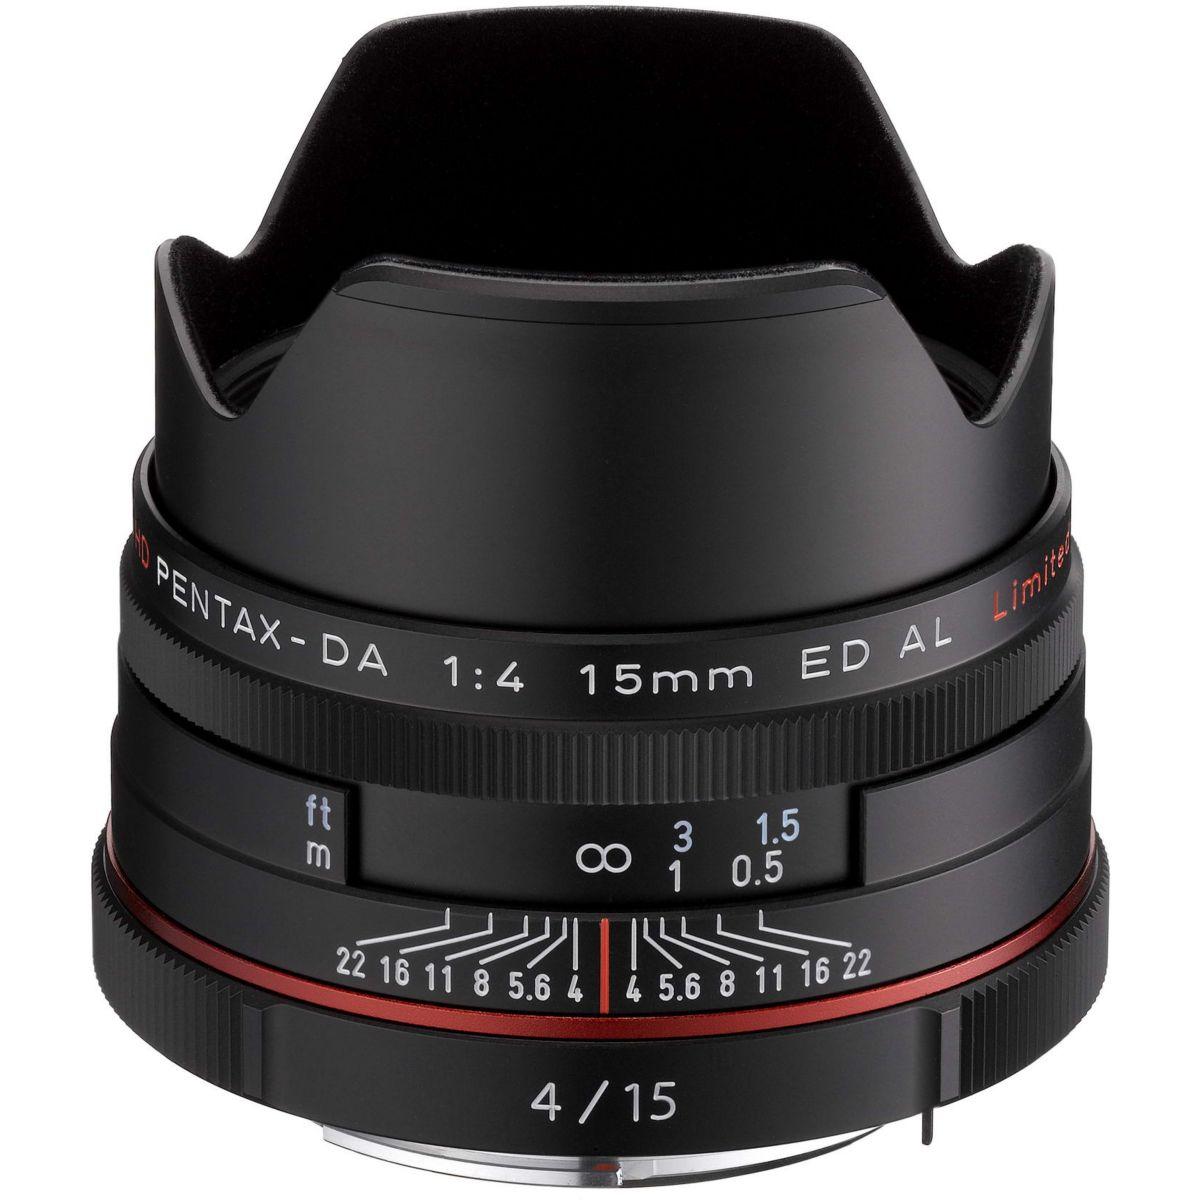 Objectif pentax hd da 15mm f/4,0 ed al limited noir